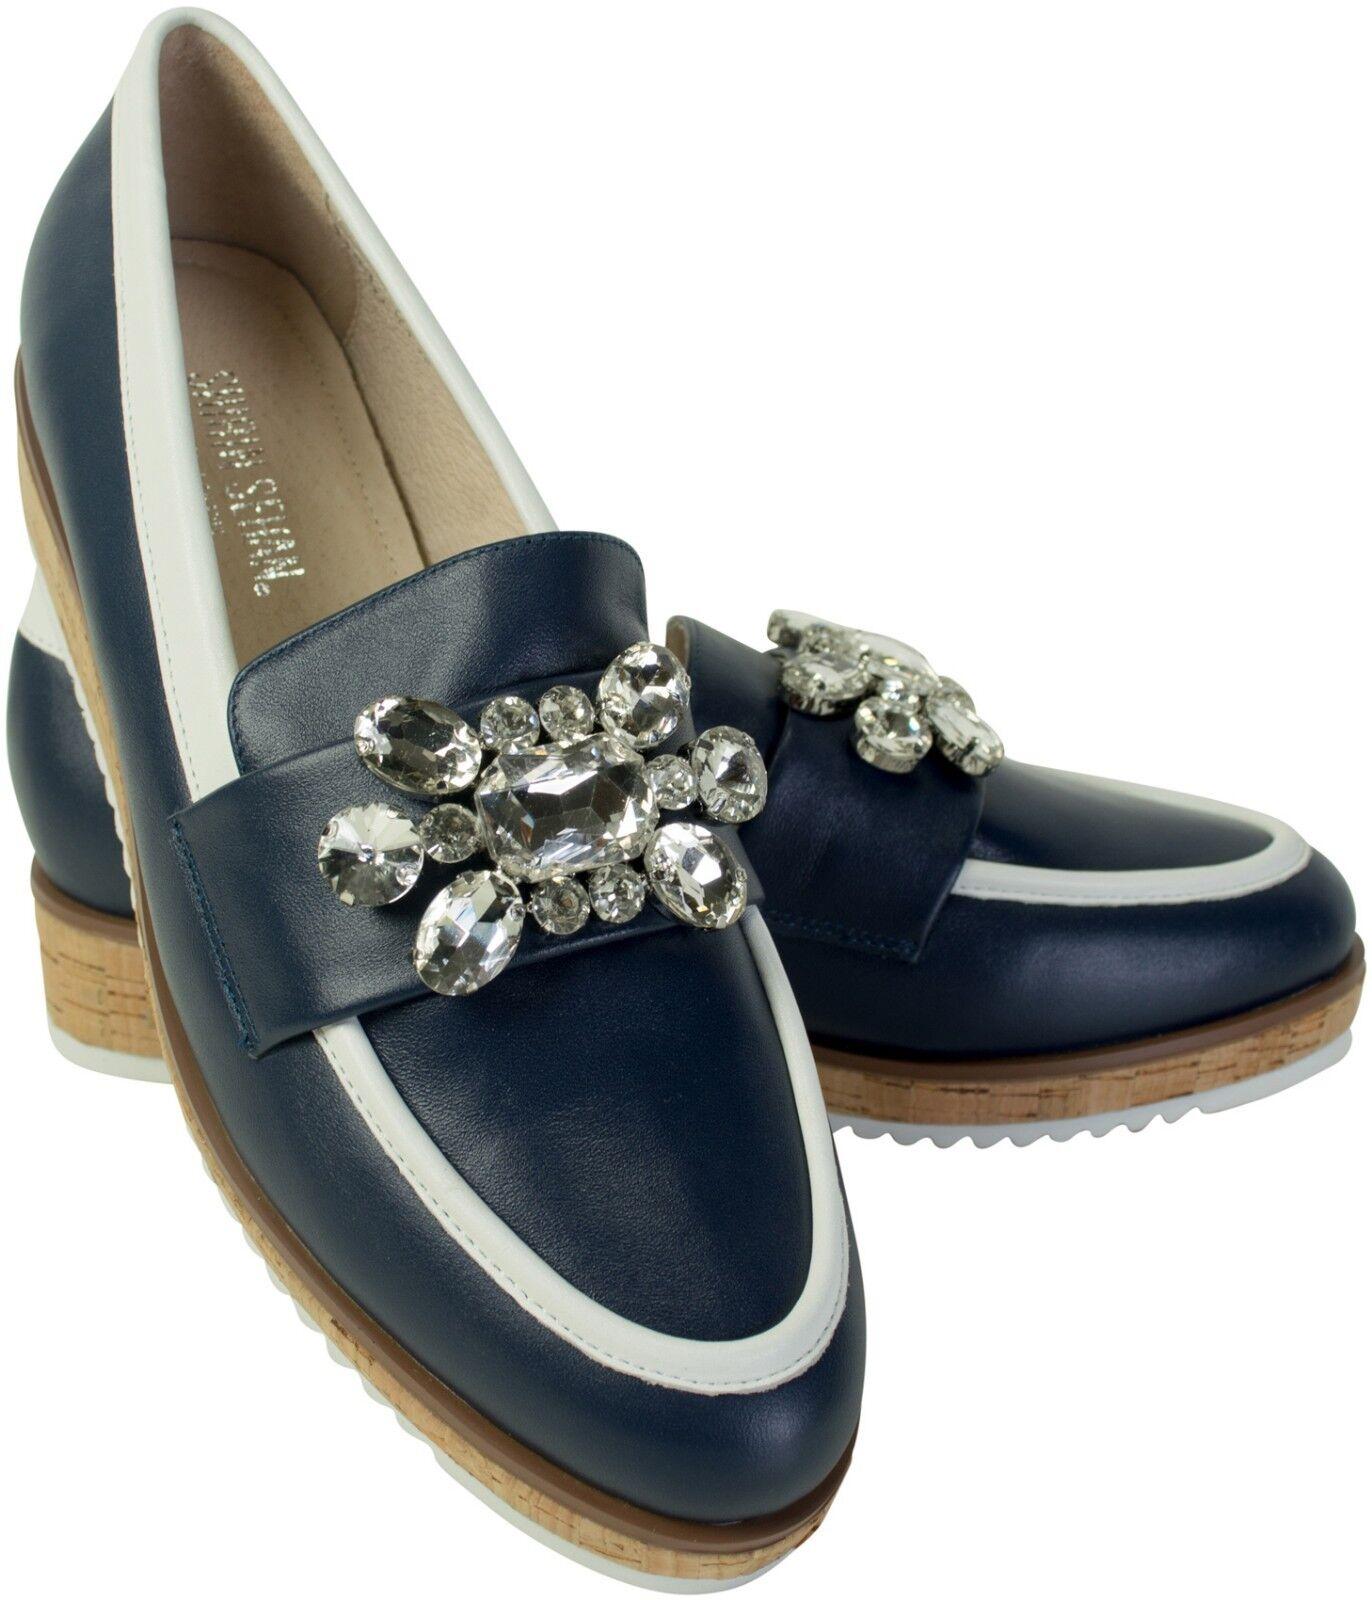 Kristallverzierte plataforma Slipper Navy azul oscuro Platform loafer loafer loafer Crystal noble  salida de fábrica